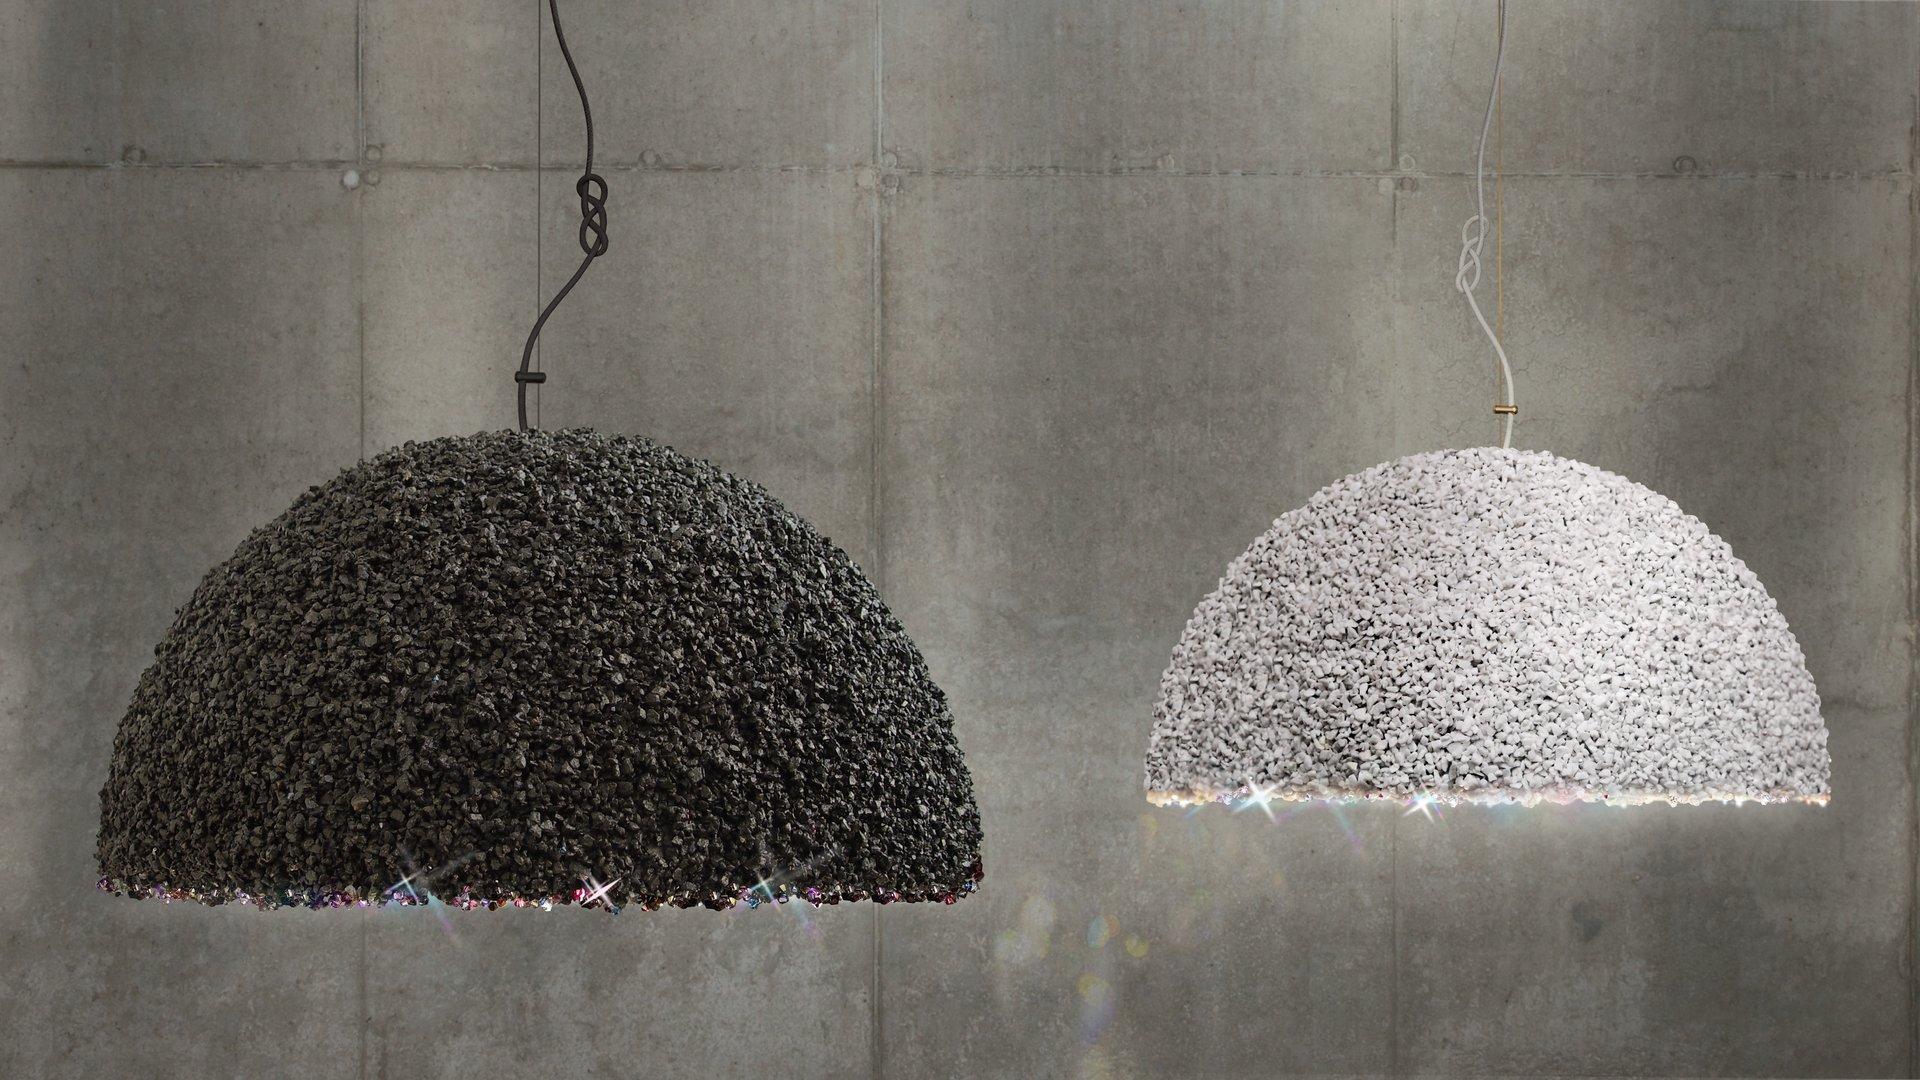 pendelleuchte the duchess schwarze herz gin ab 870 eur online. Black Bedroom Furniture Sets. Home Design Ideas